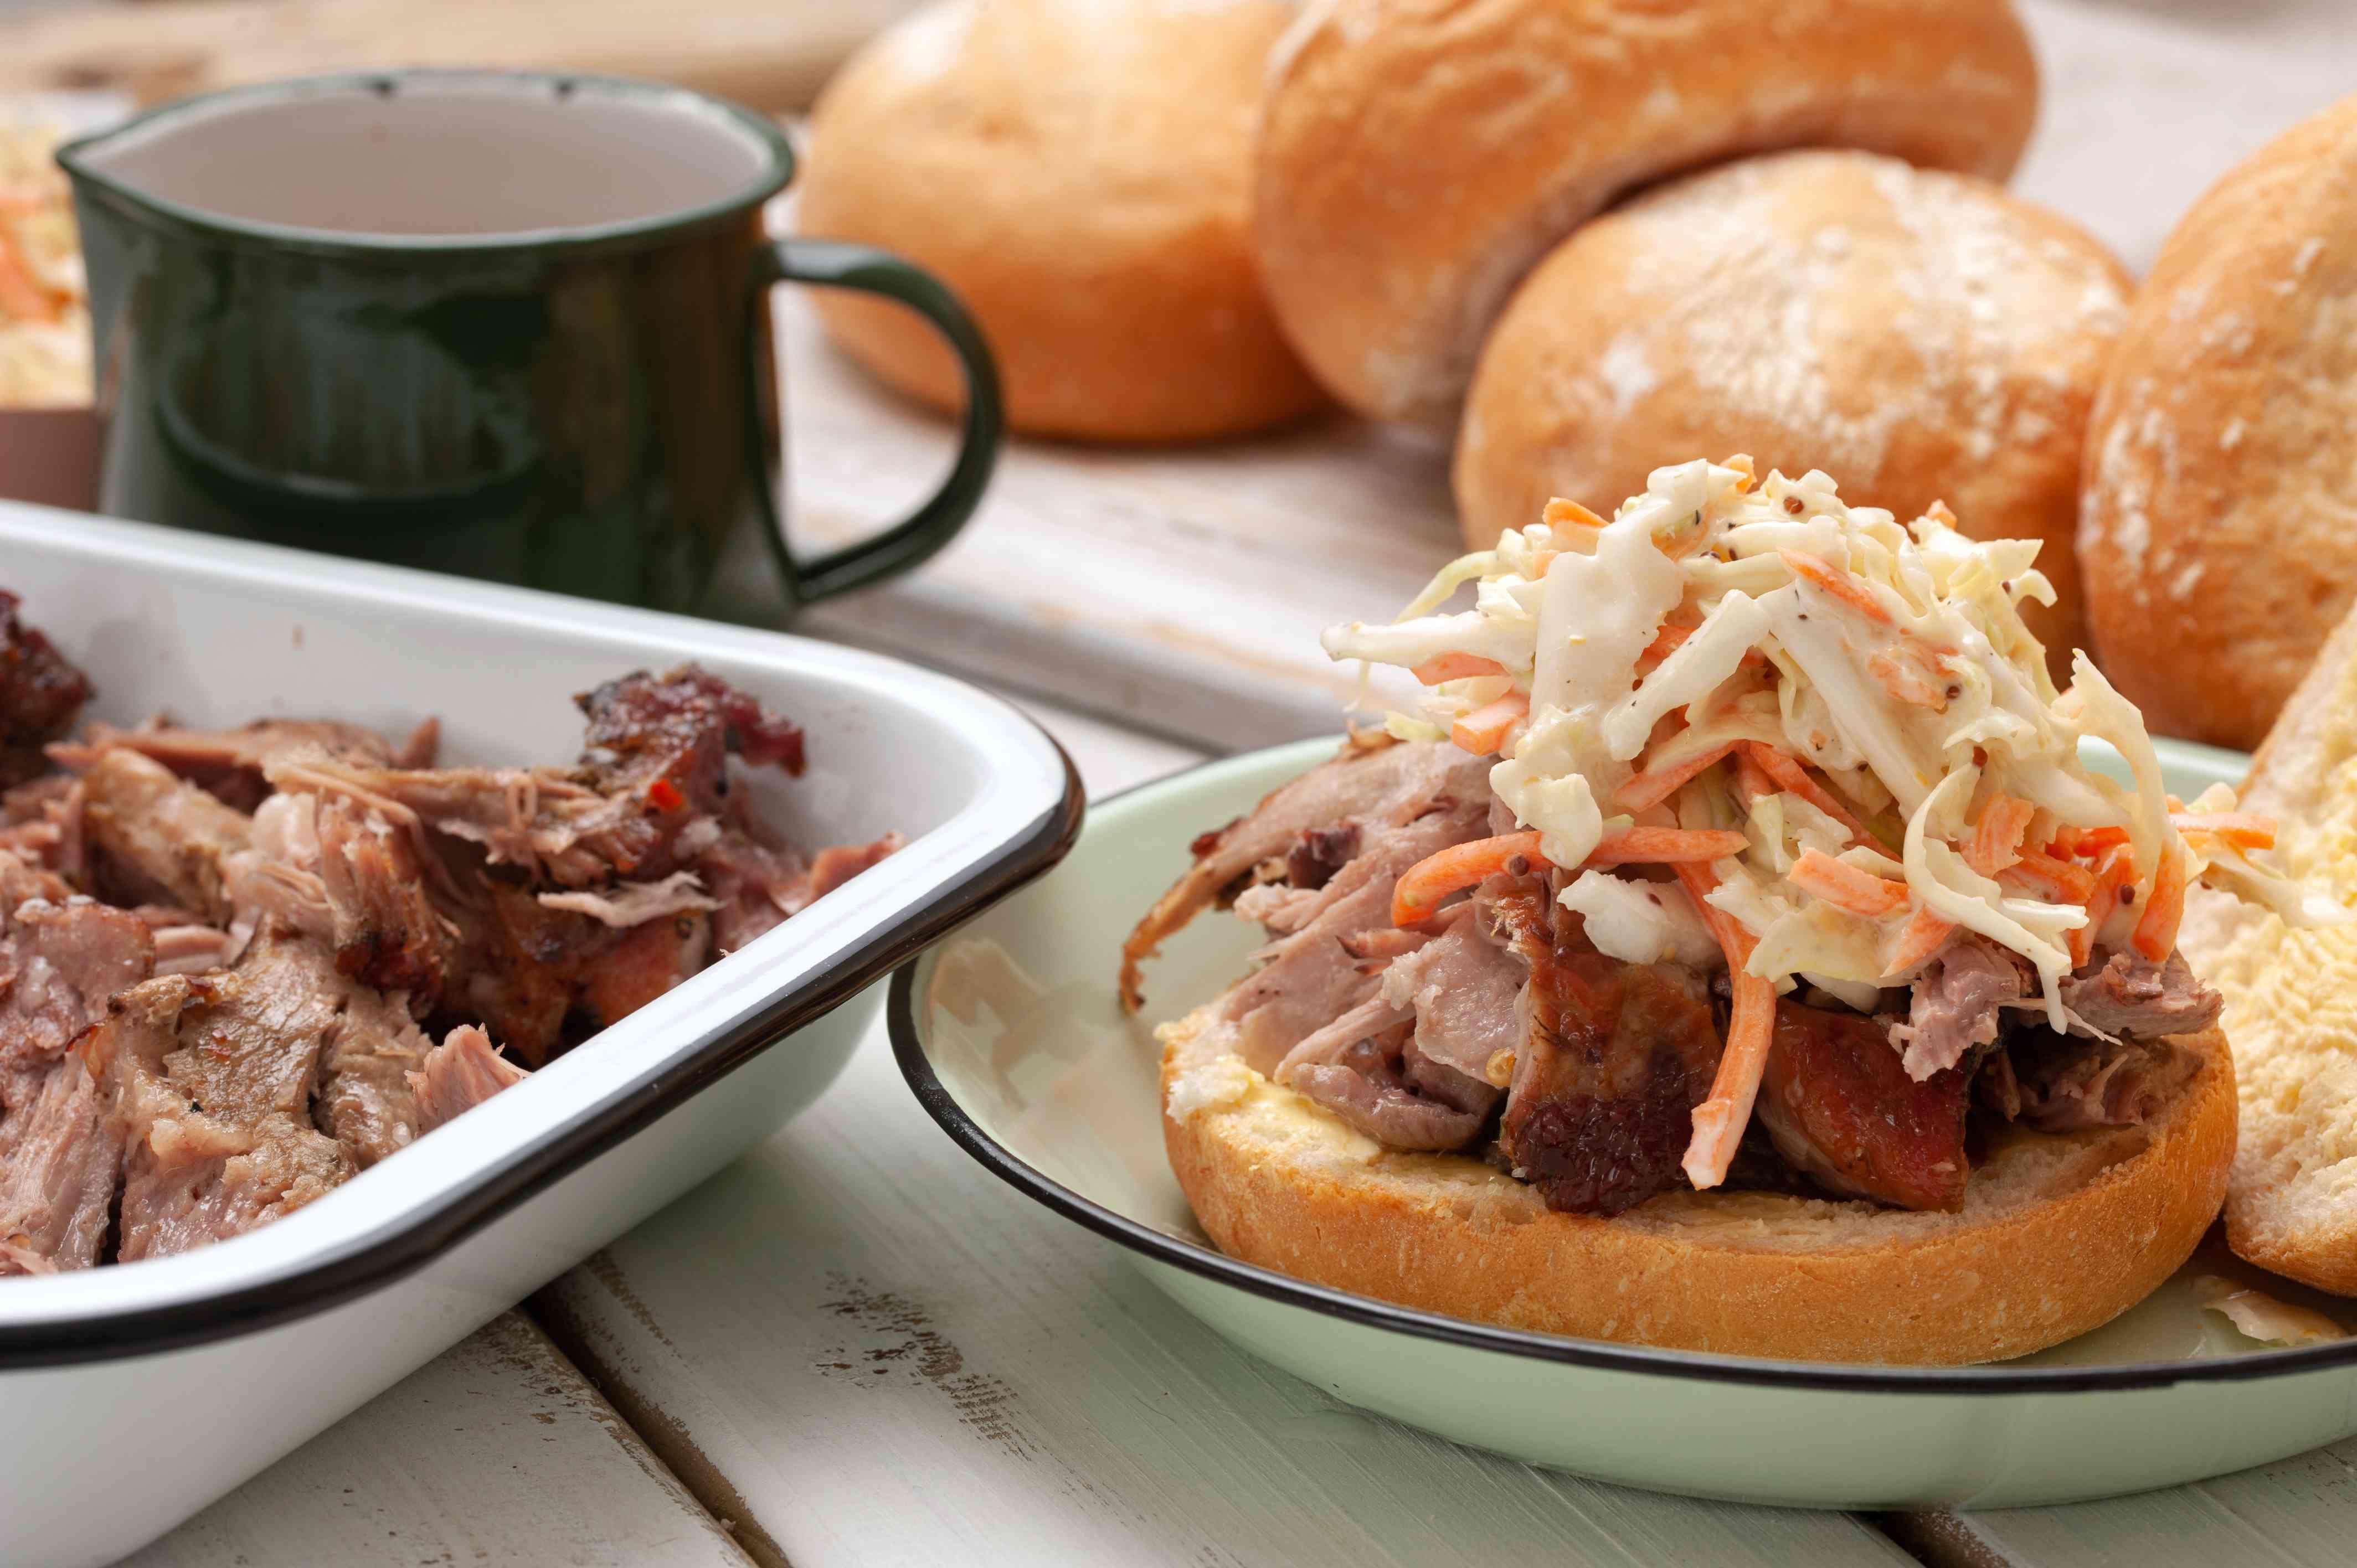 North Carolina style pulled pork